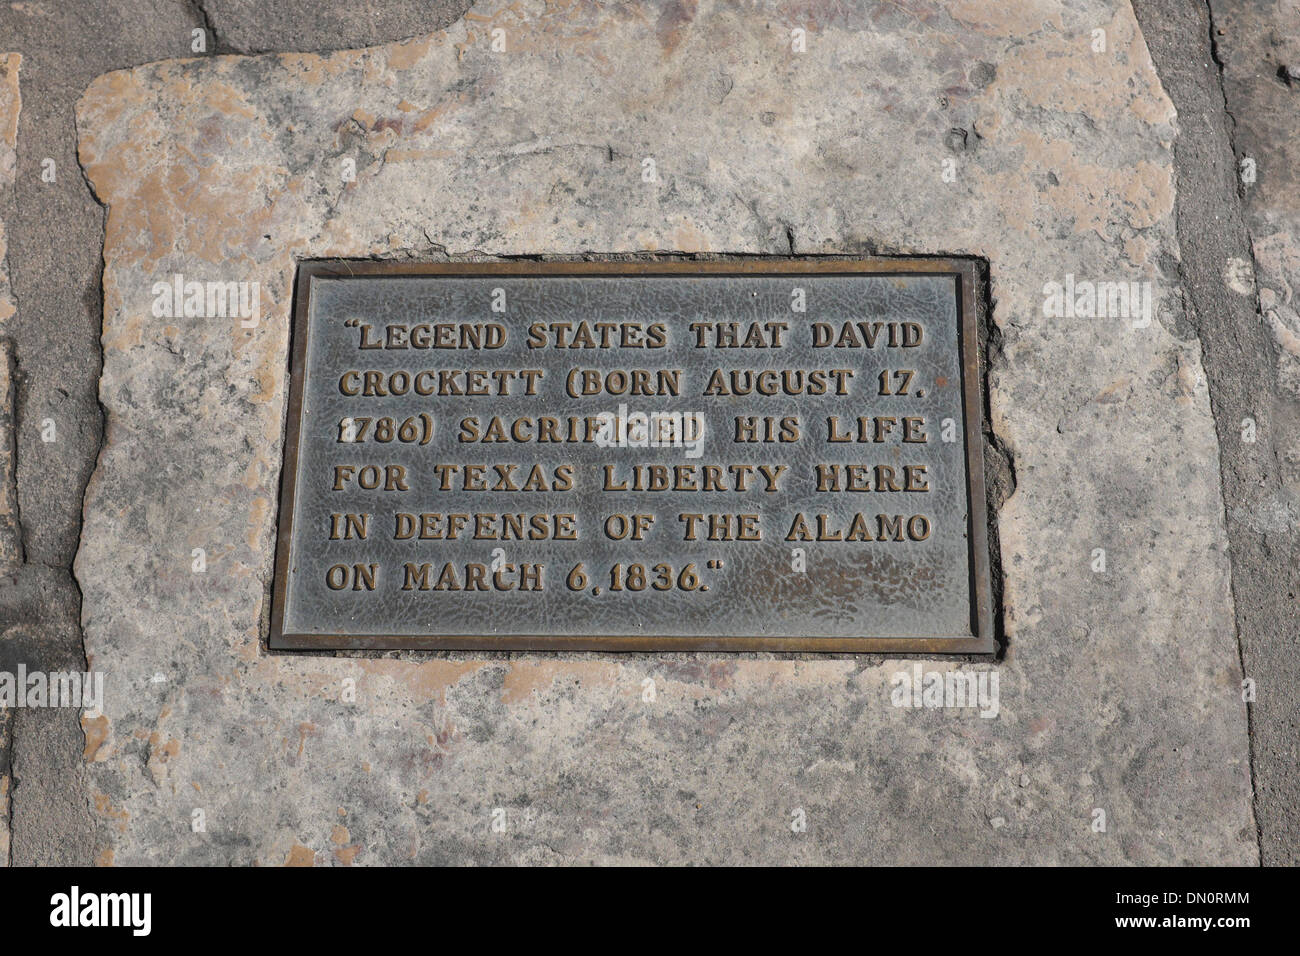 Plaque at Alamo indicating where David Crockett lost his life, March 6, 1836 - Stock Image